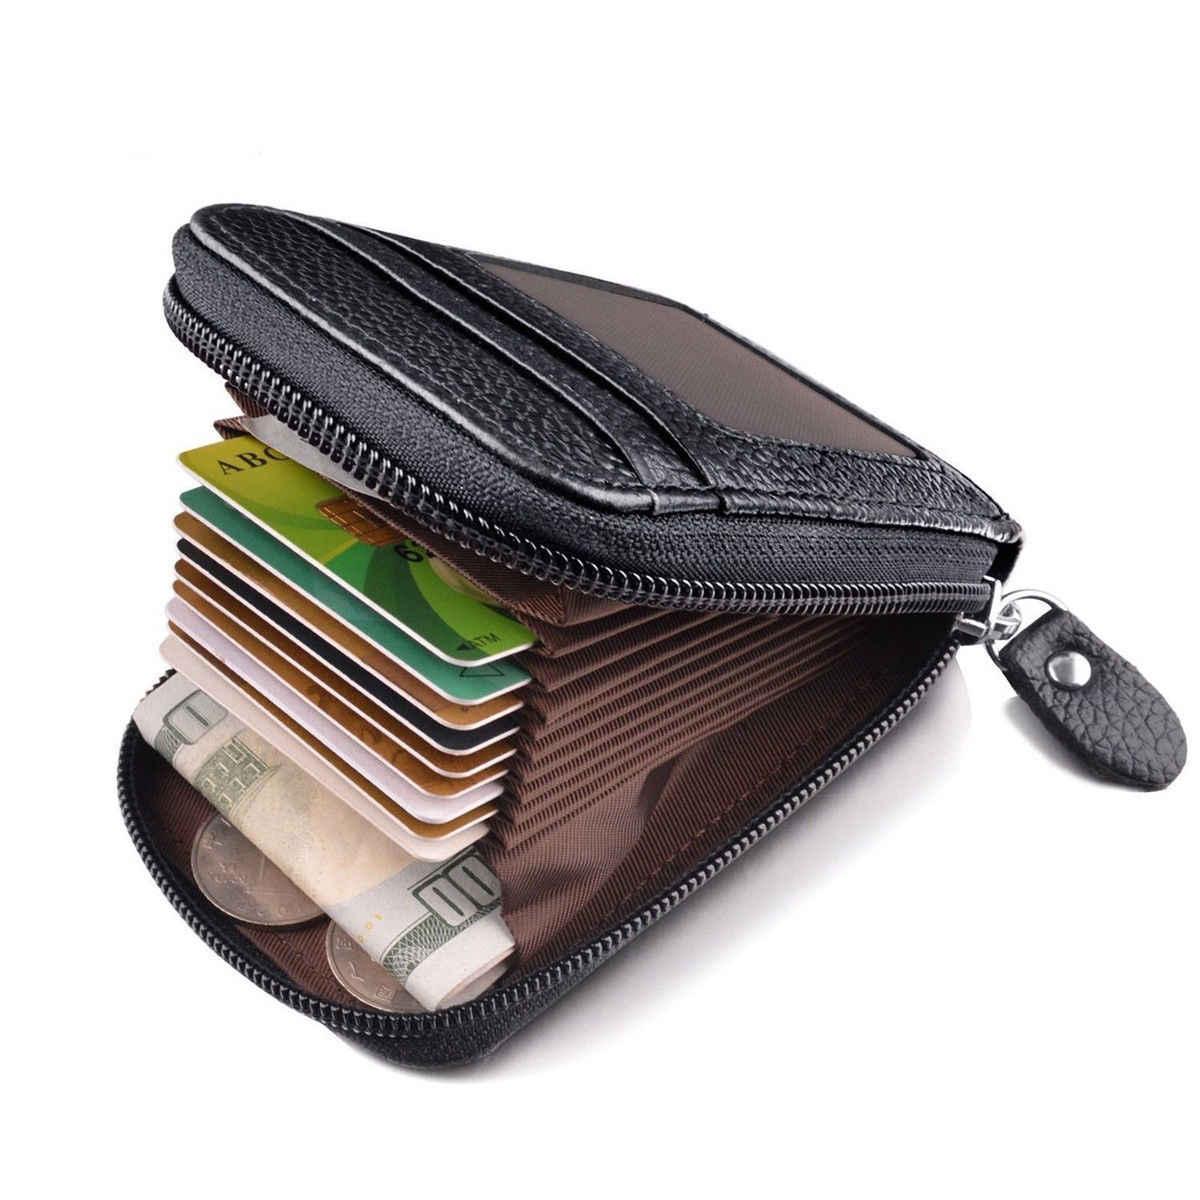 0e500dc04eb5 Men's Wallet Genuine Leather Credit Card Holder RFID Blocking Zipper Thin  Pocket Zip Around Pocket Bifold Wallet Gift